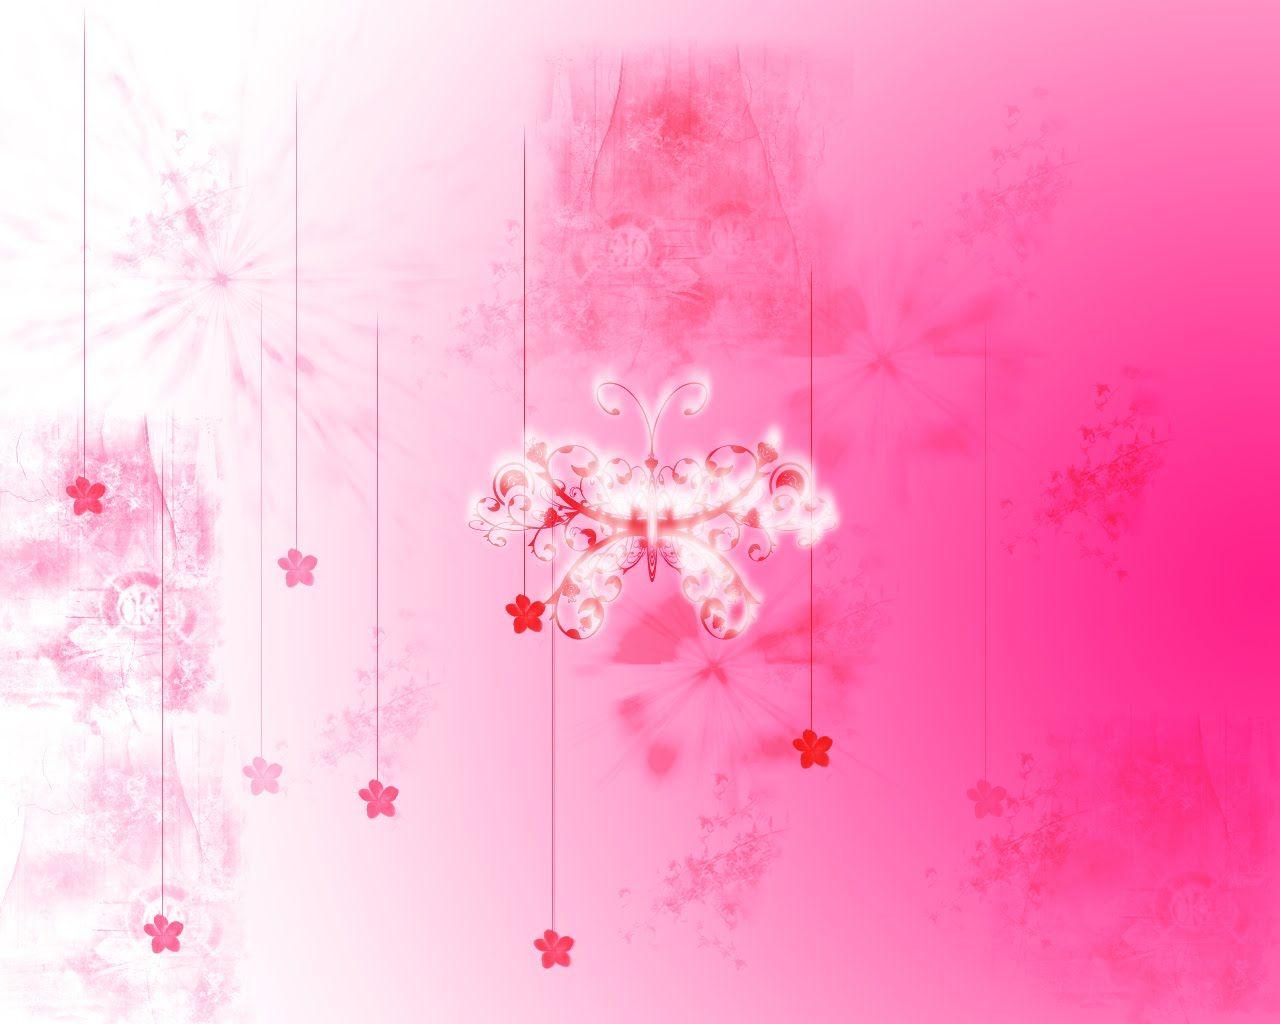 Pink Alayx Hd Beautiful Girly Backgrounds Wallpaper Pink